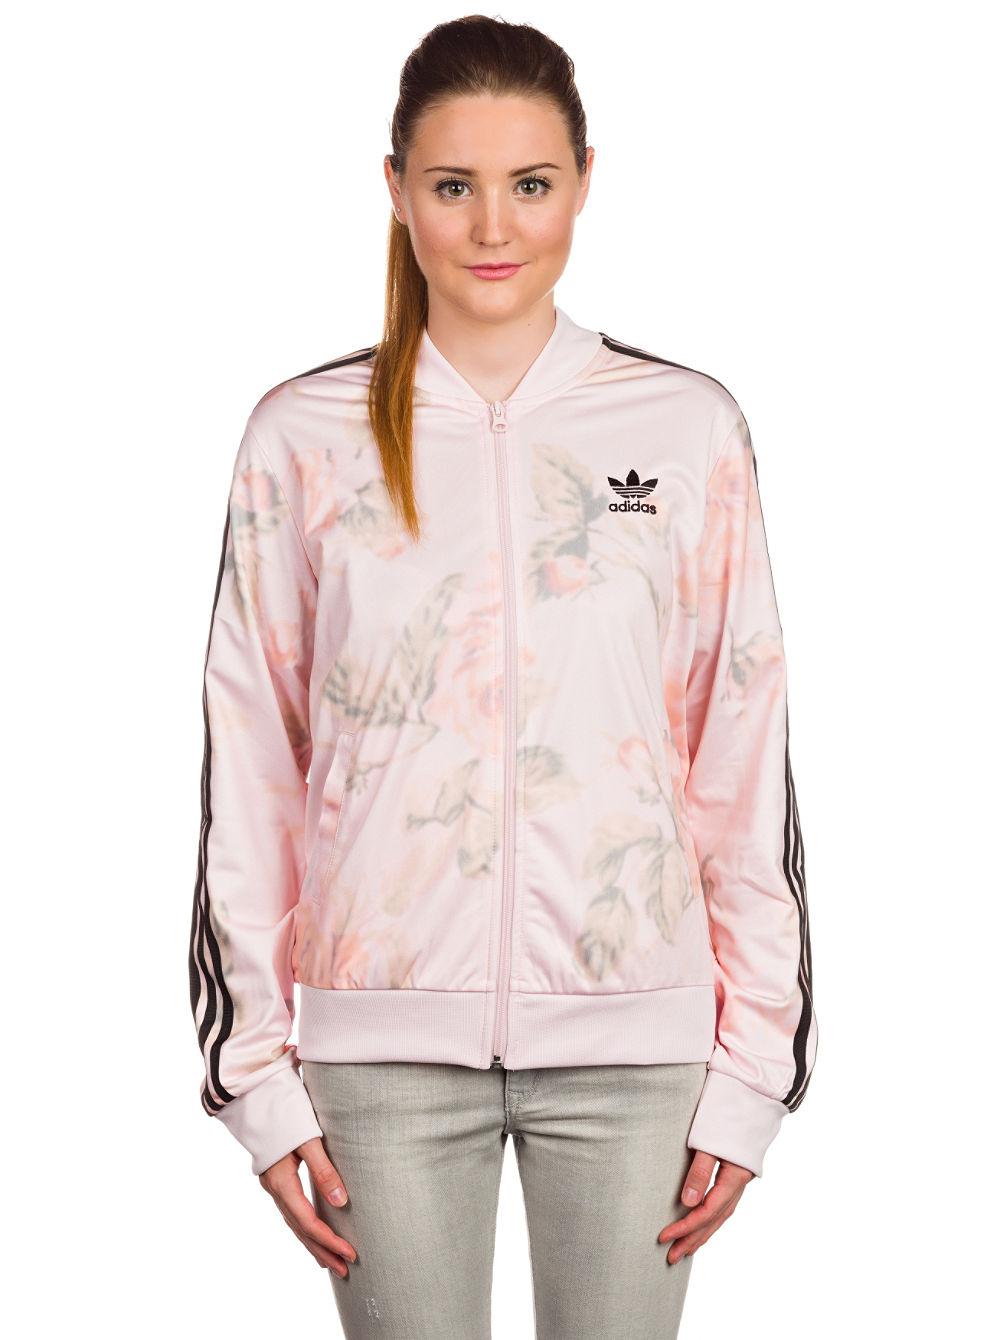 832bf0ff9ec8 Buy adidas Originals Pastel Rose TT Jacket online at Blue Tomato